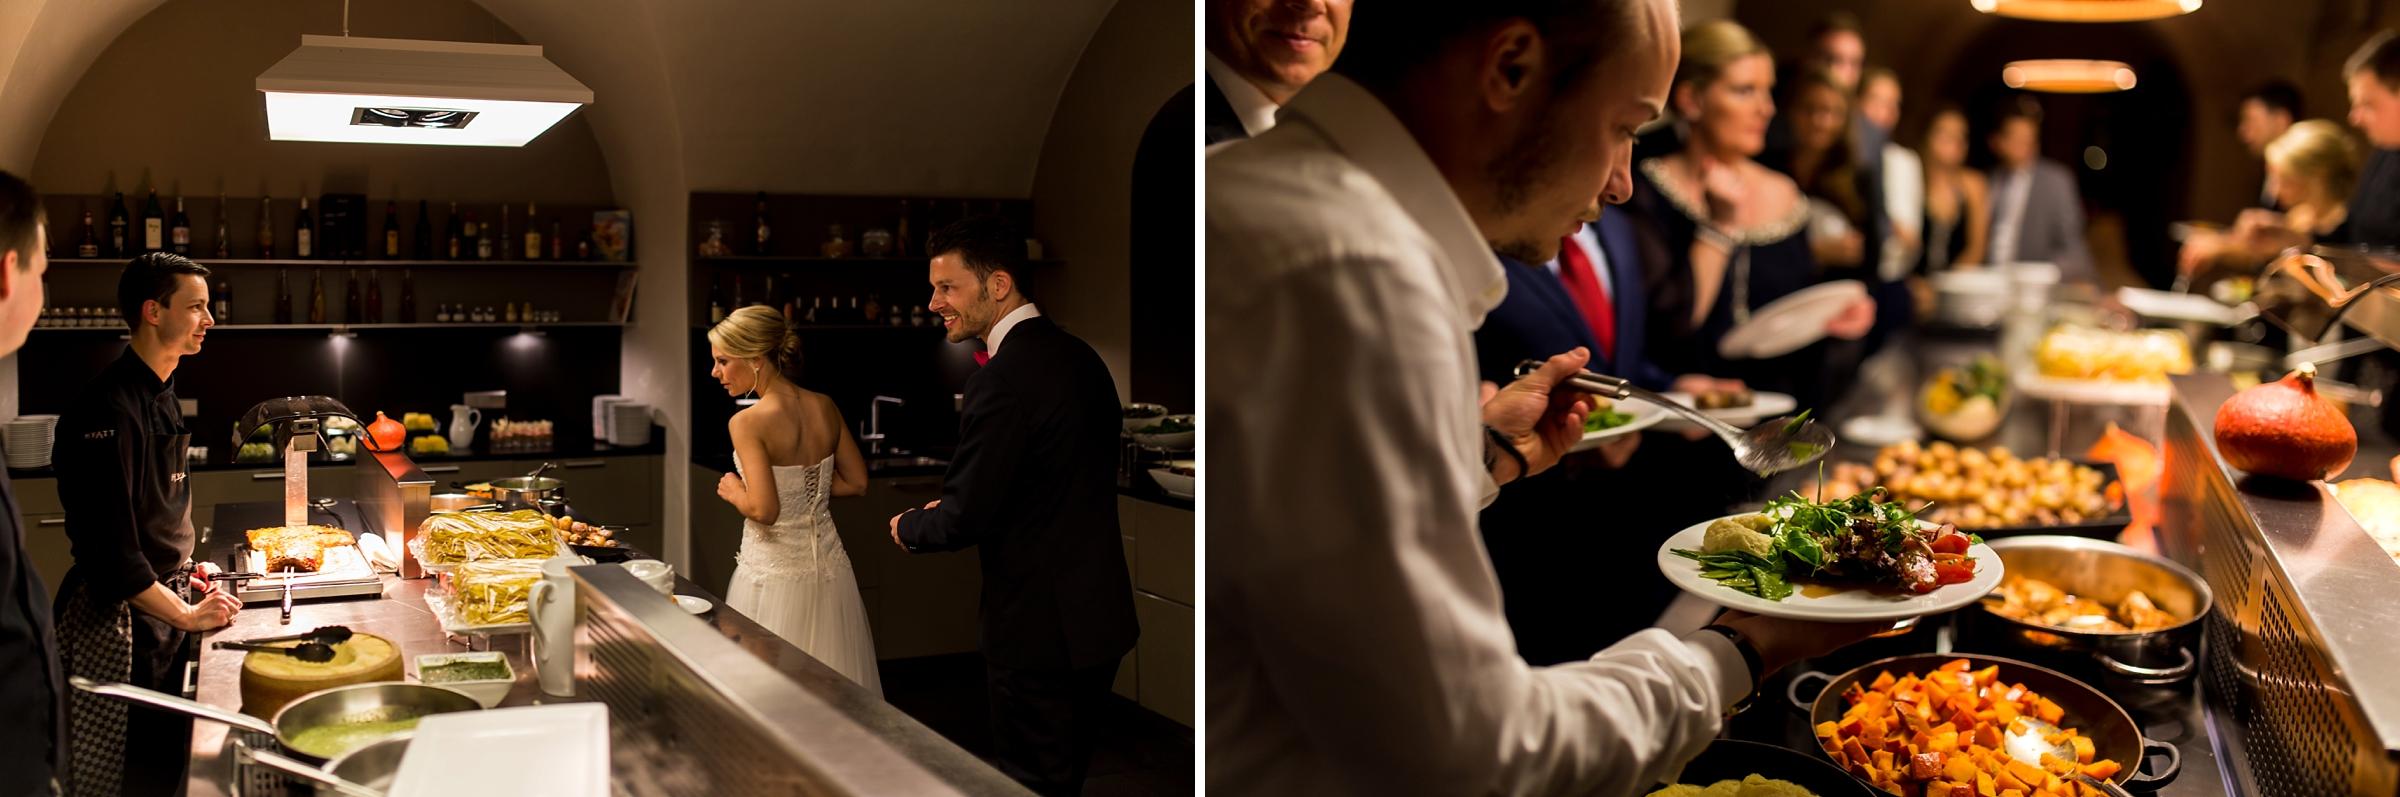 Hochzeitsreportage-Mainz-Hyatt-Regency-Live-Cooking-Buffet